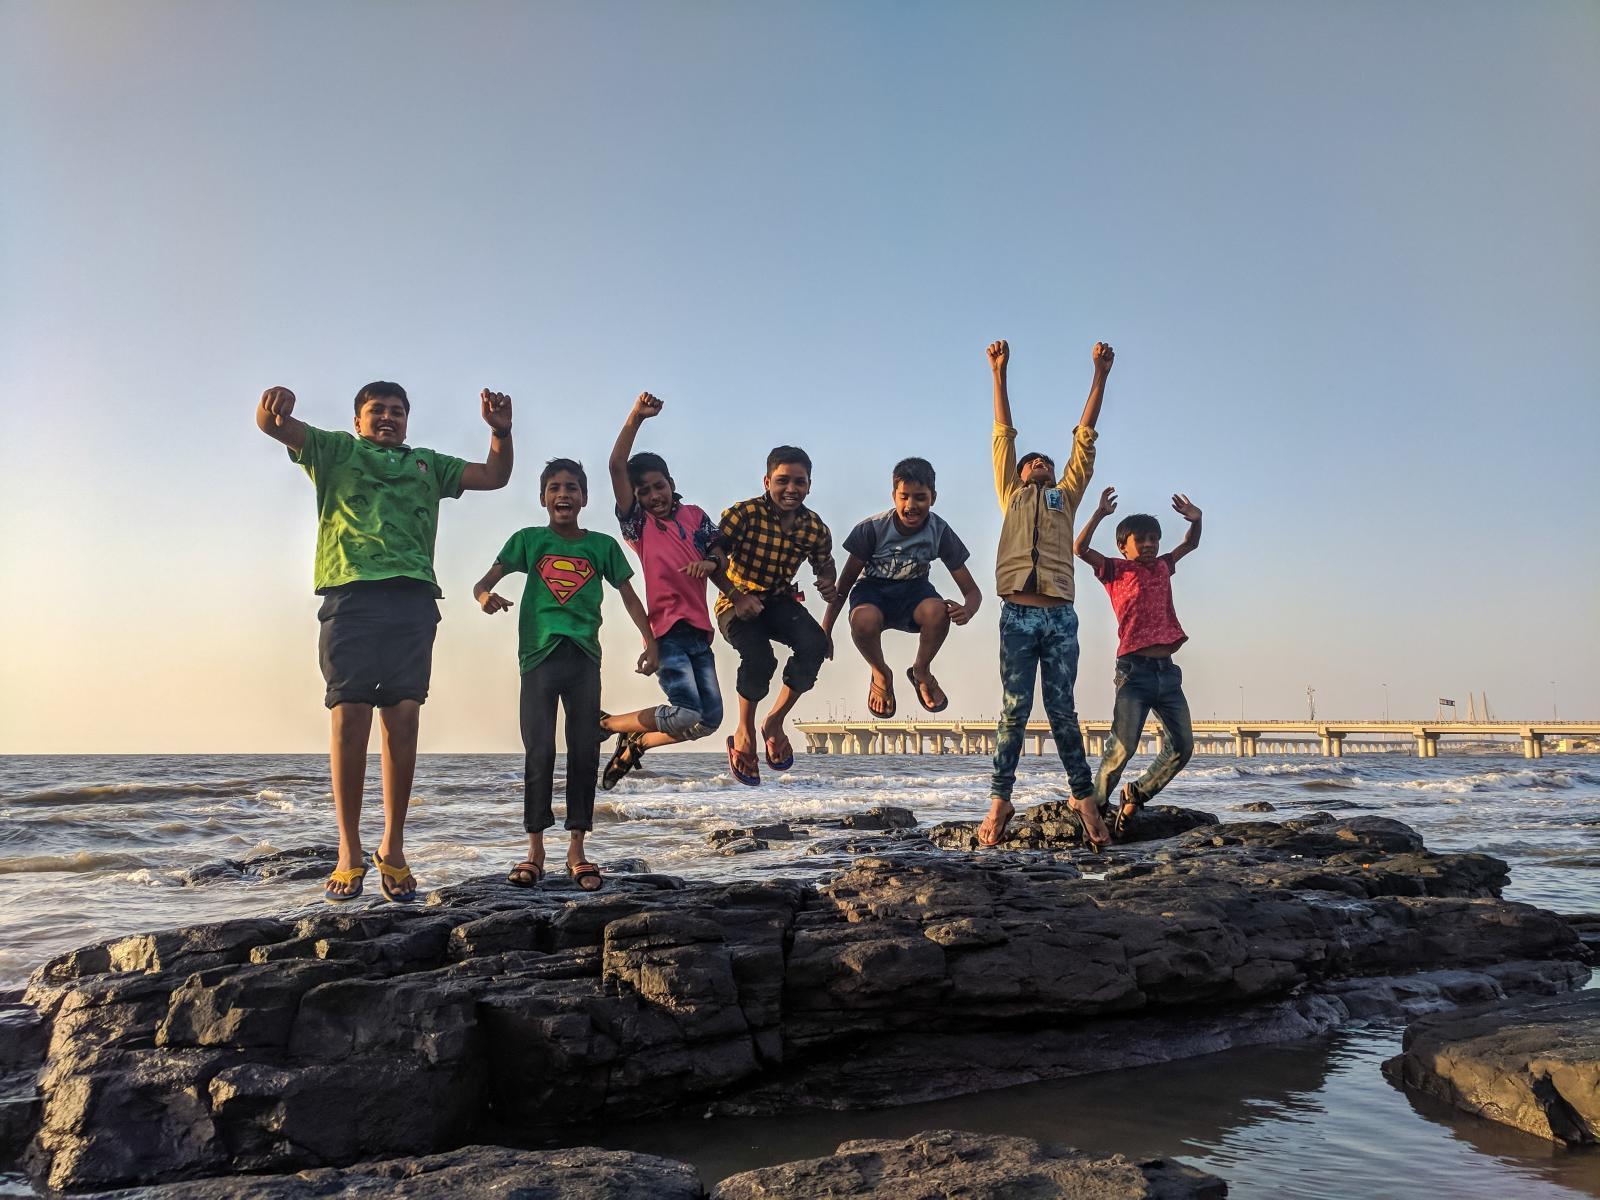 Photo by Guduru Ajay Bhargav from Pexels